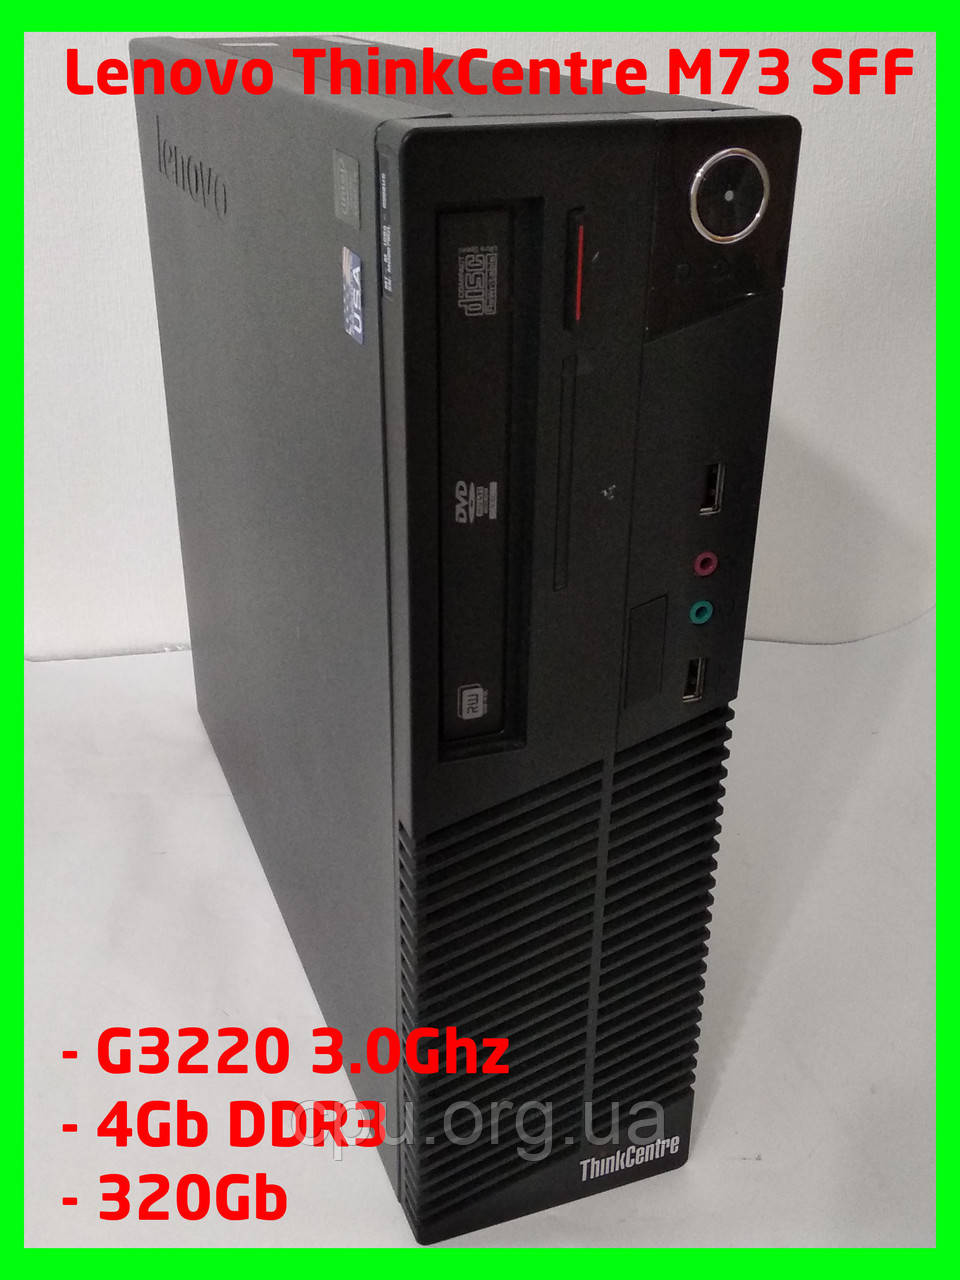 ПК Lenovo M73 SFF- G3220 2 ядра + 4GB DDR3 + 320gb